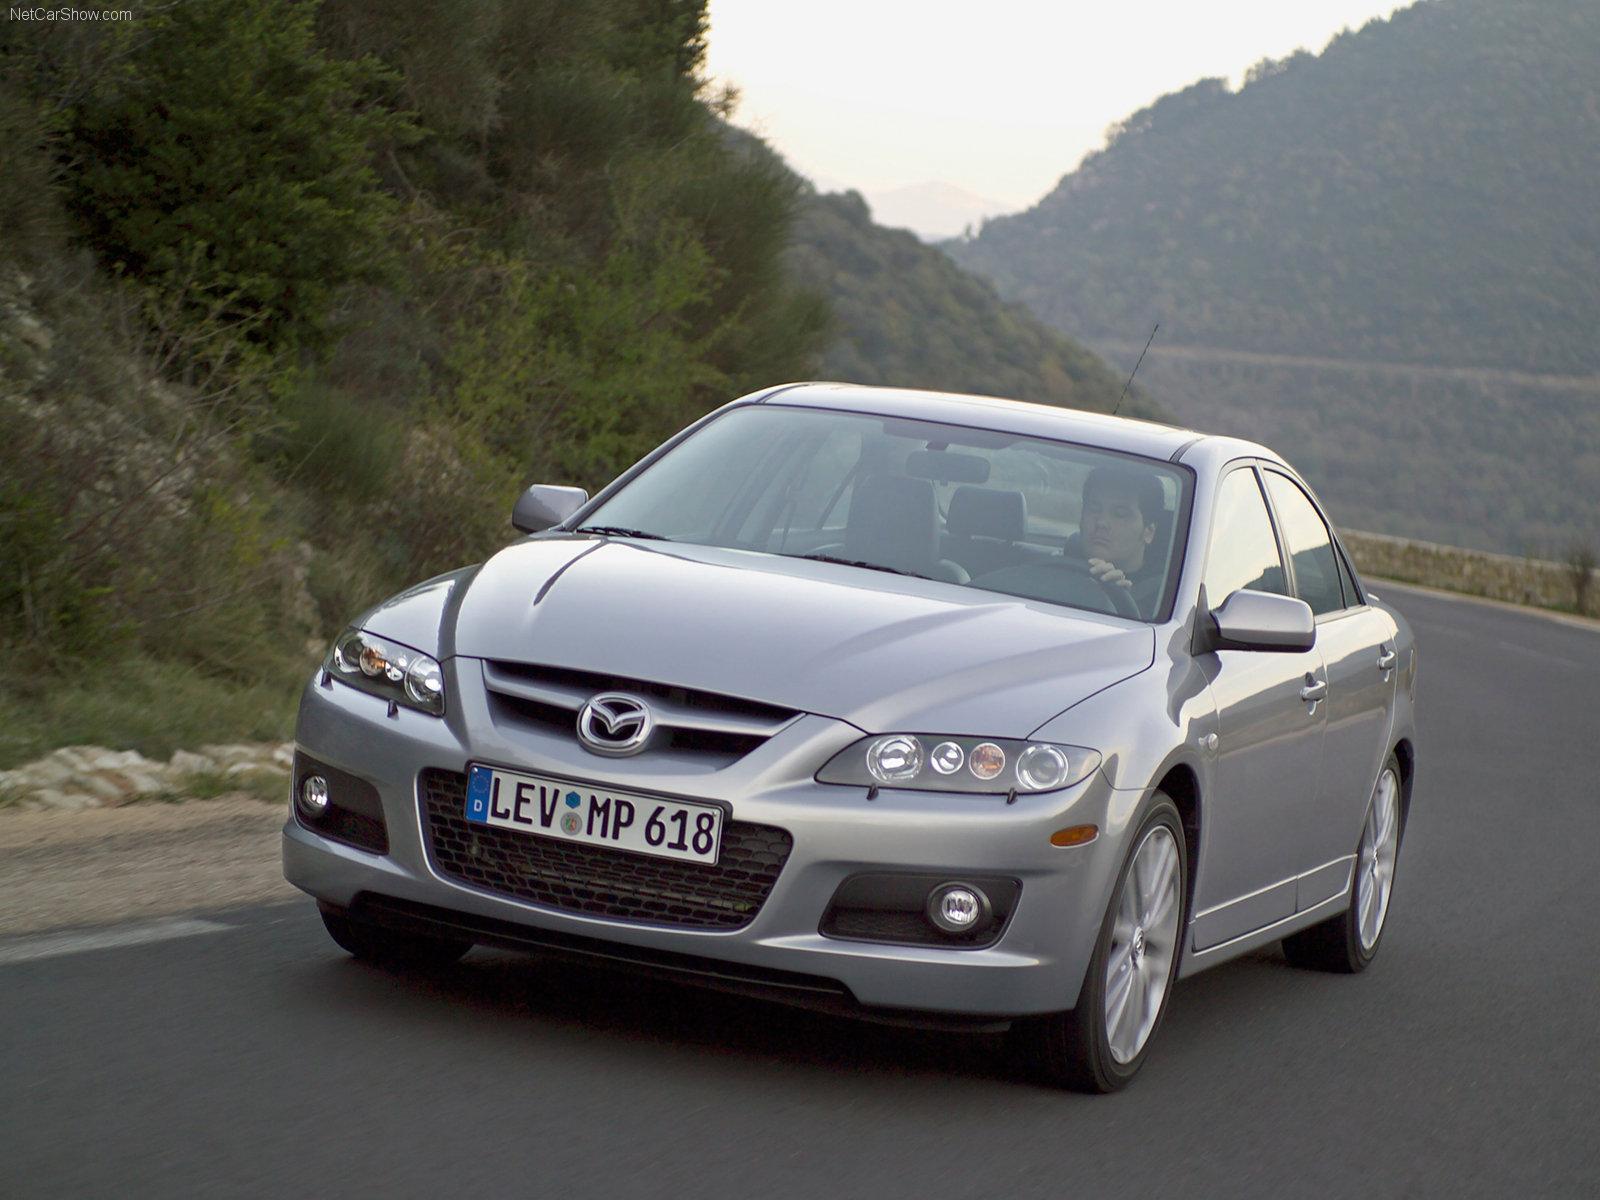 http://www.carsbase.com/photo/Mazda-6_MPS_mp34_pic_33069.jpg